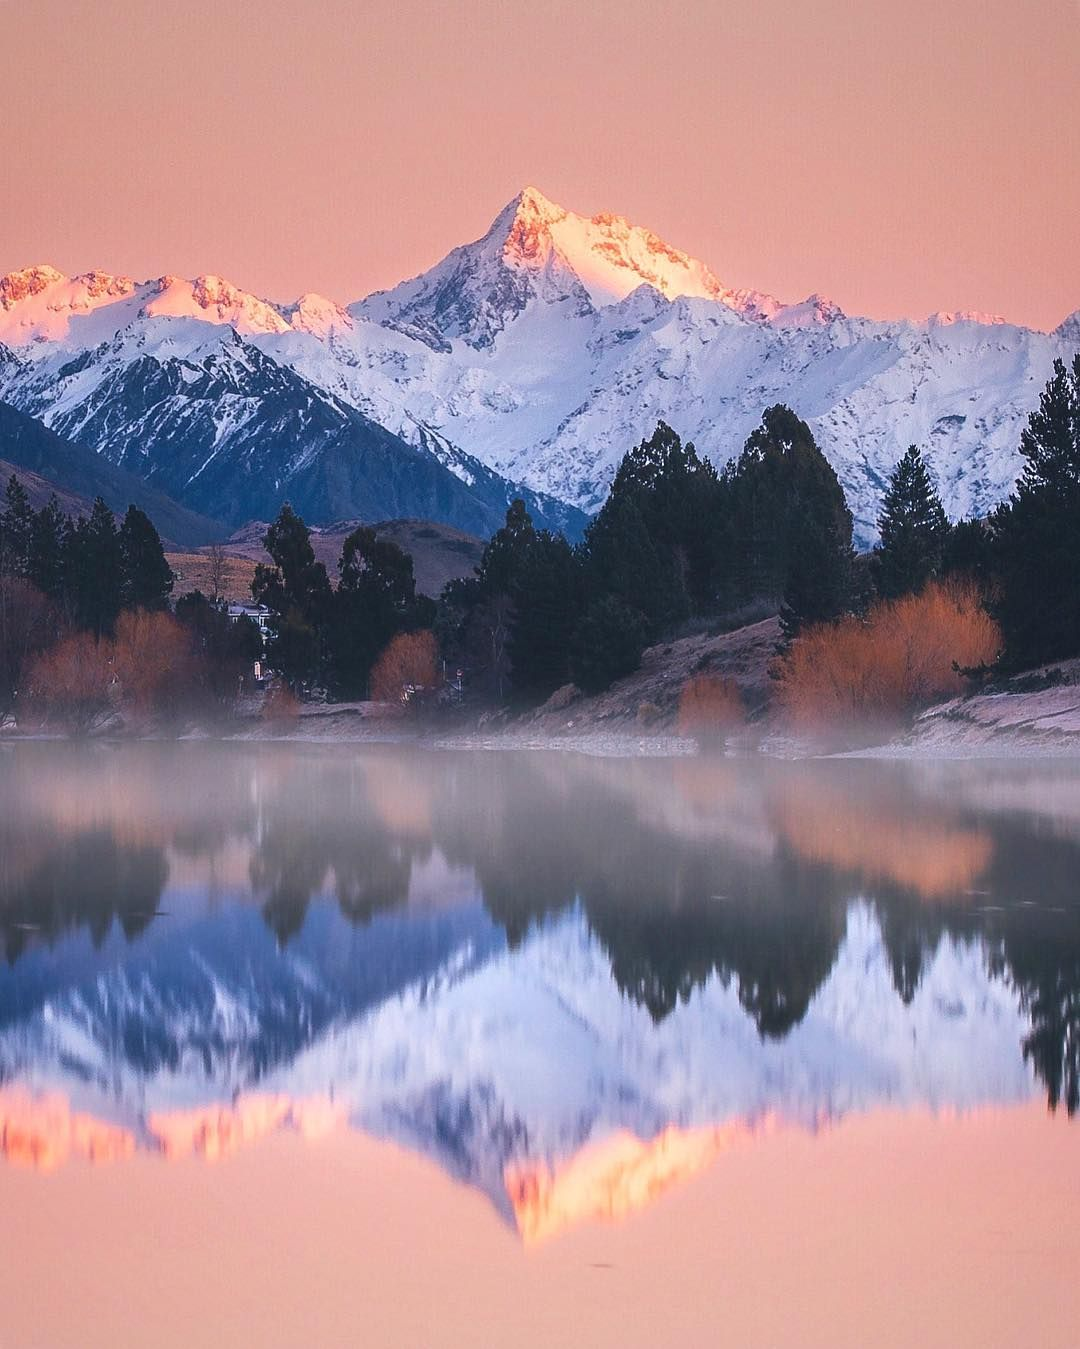 #newzealand: Fine Art Landscape Photography by Rachel Stewart #naturallandmarks